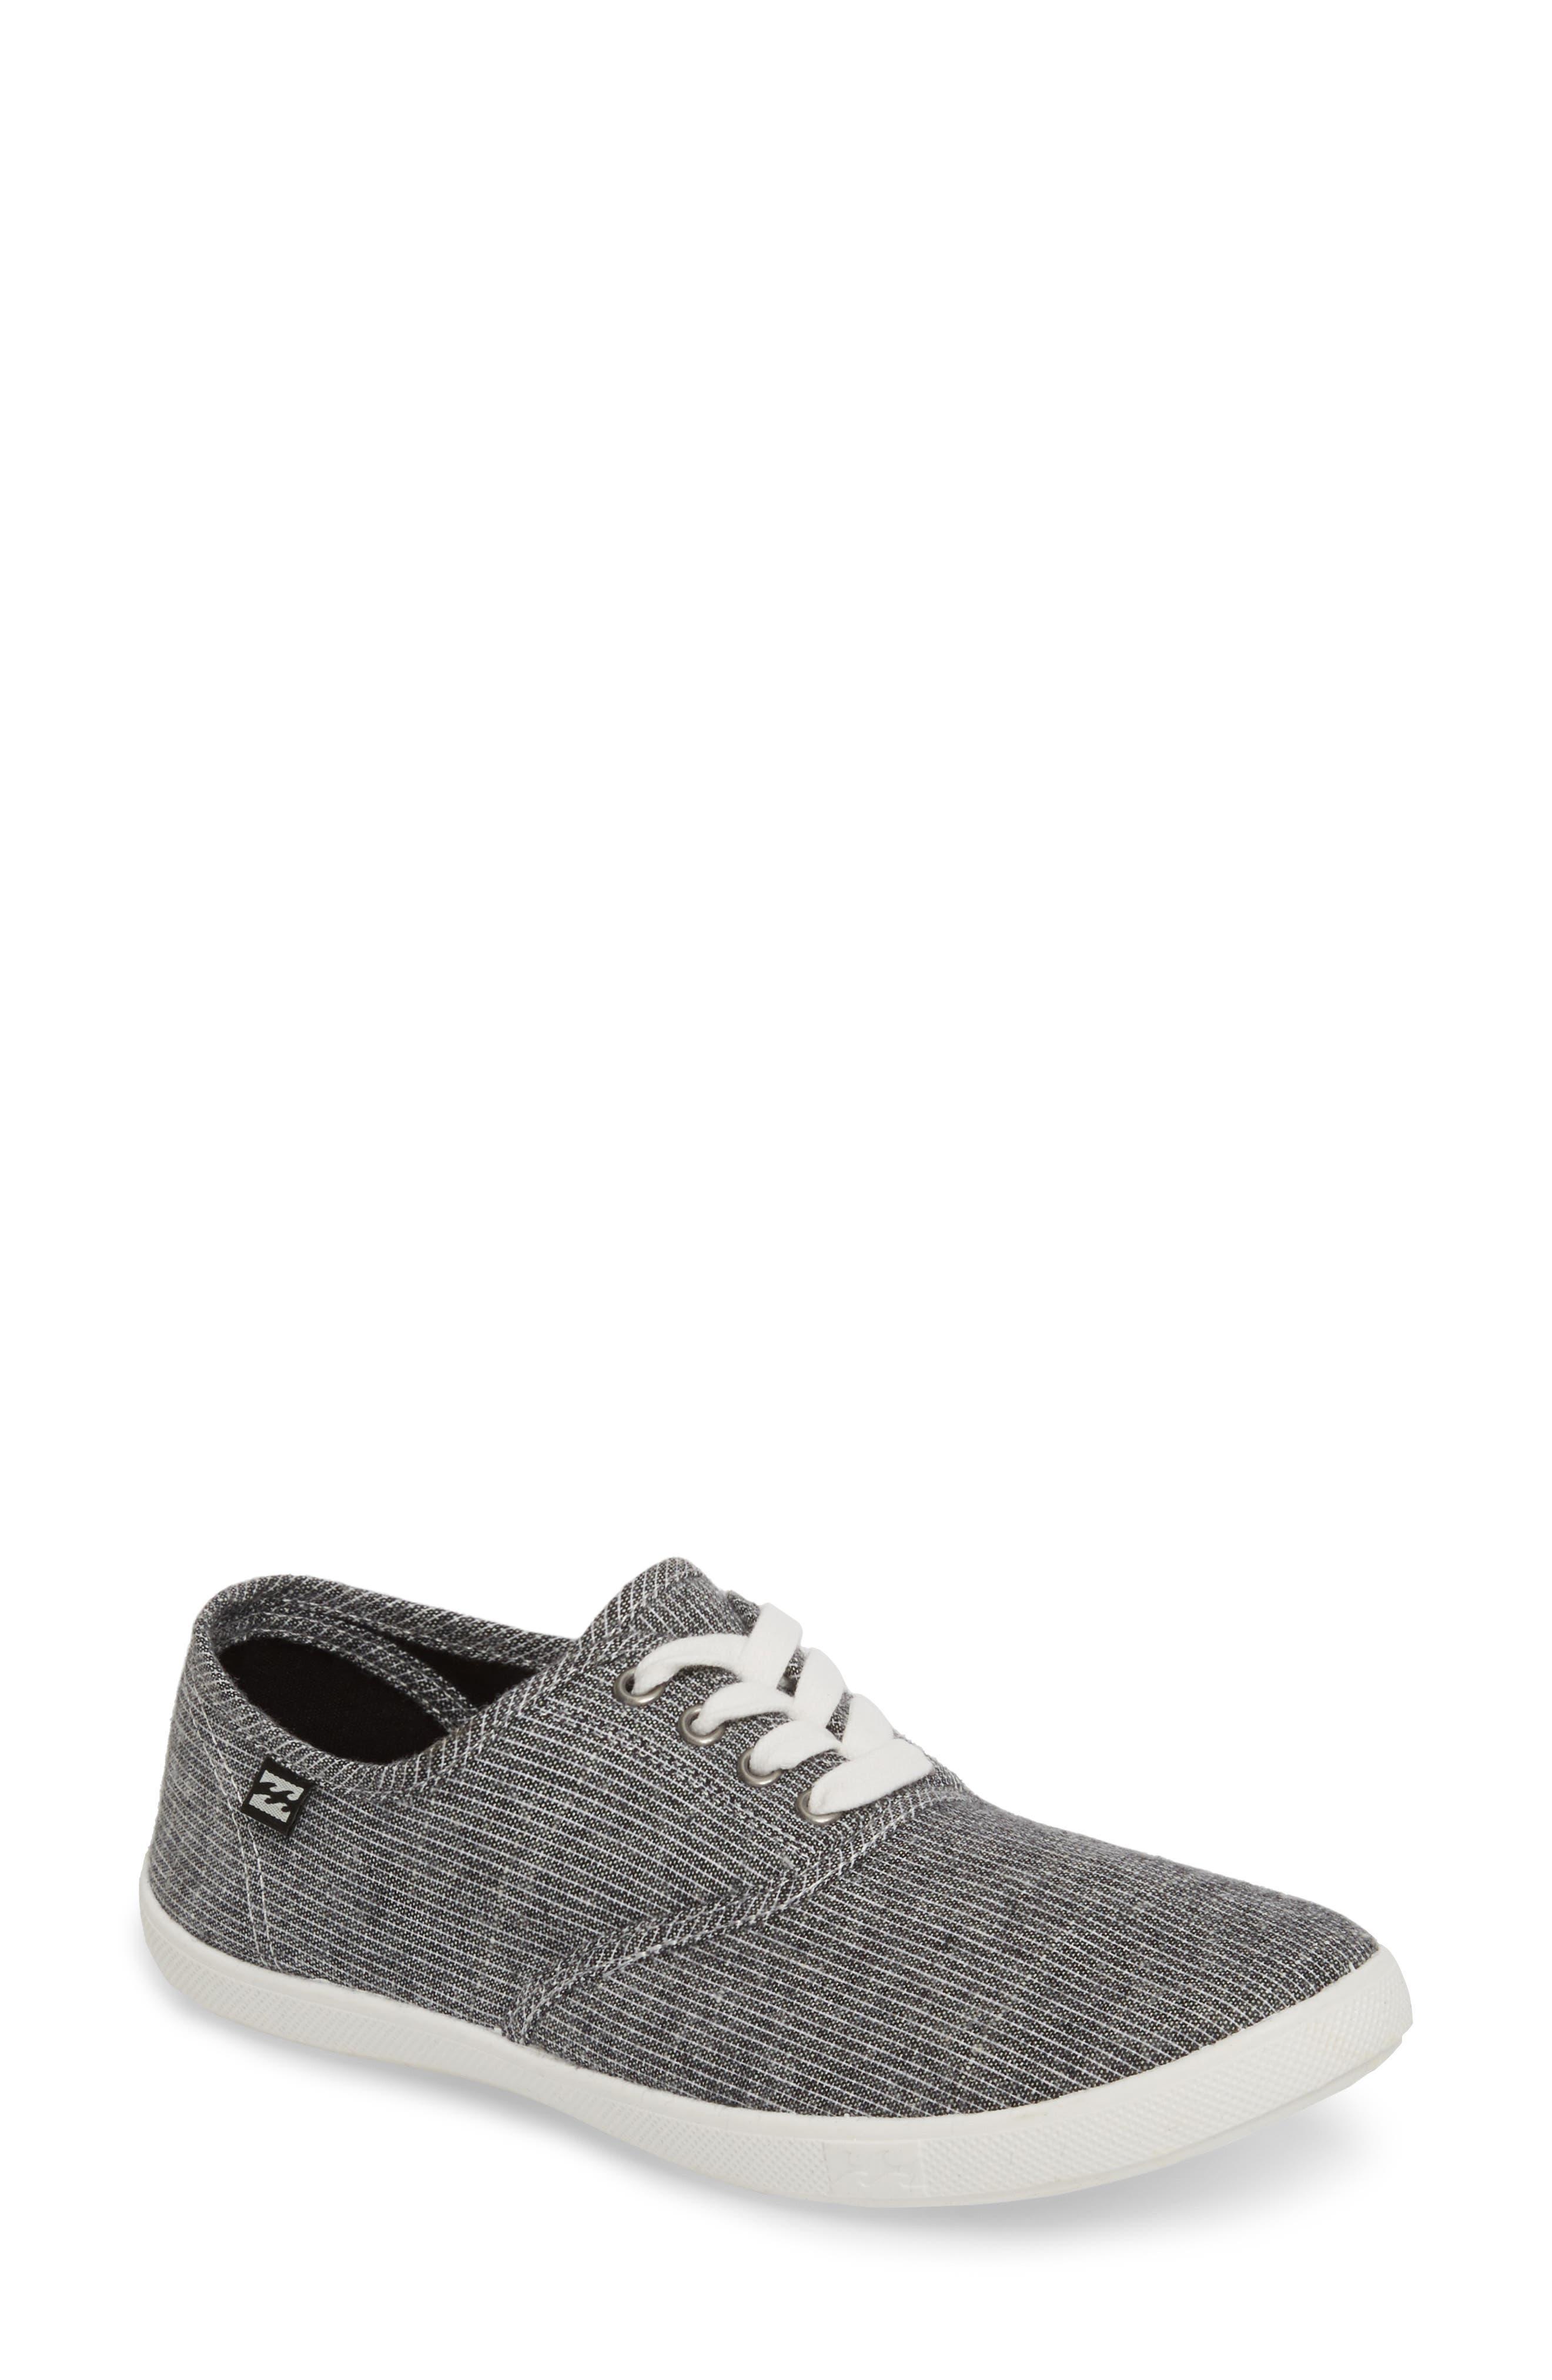 Addy Sneaker,                             Main thumbnail 1, color,                             Black/ White